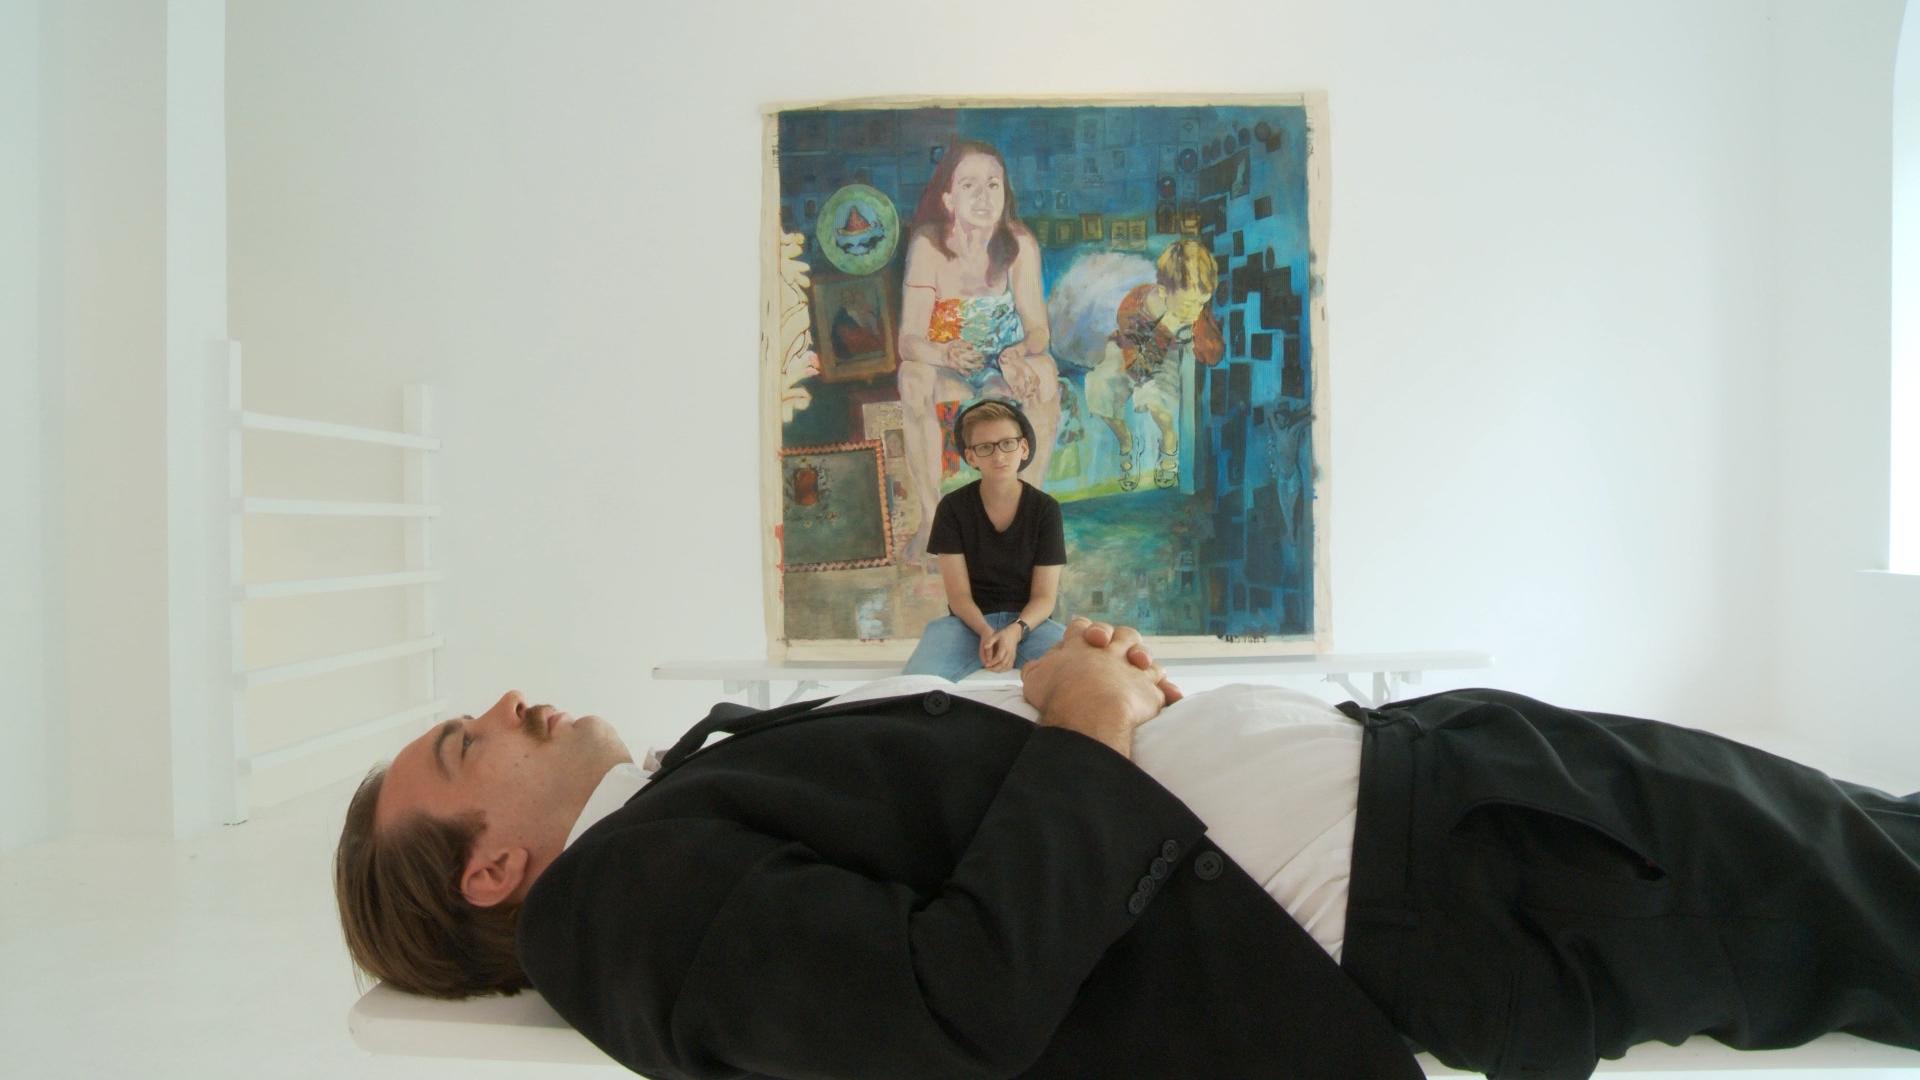 M.M. Eschenbach, Jasper Barwasser - Folge 11